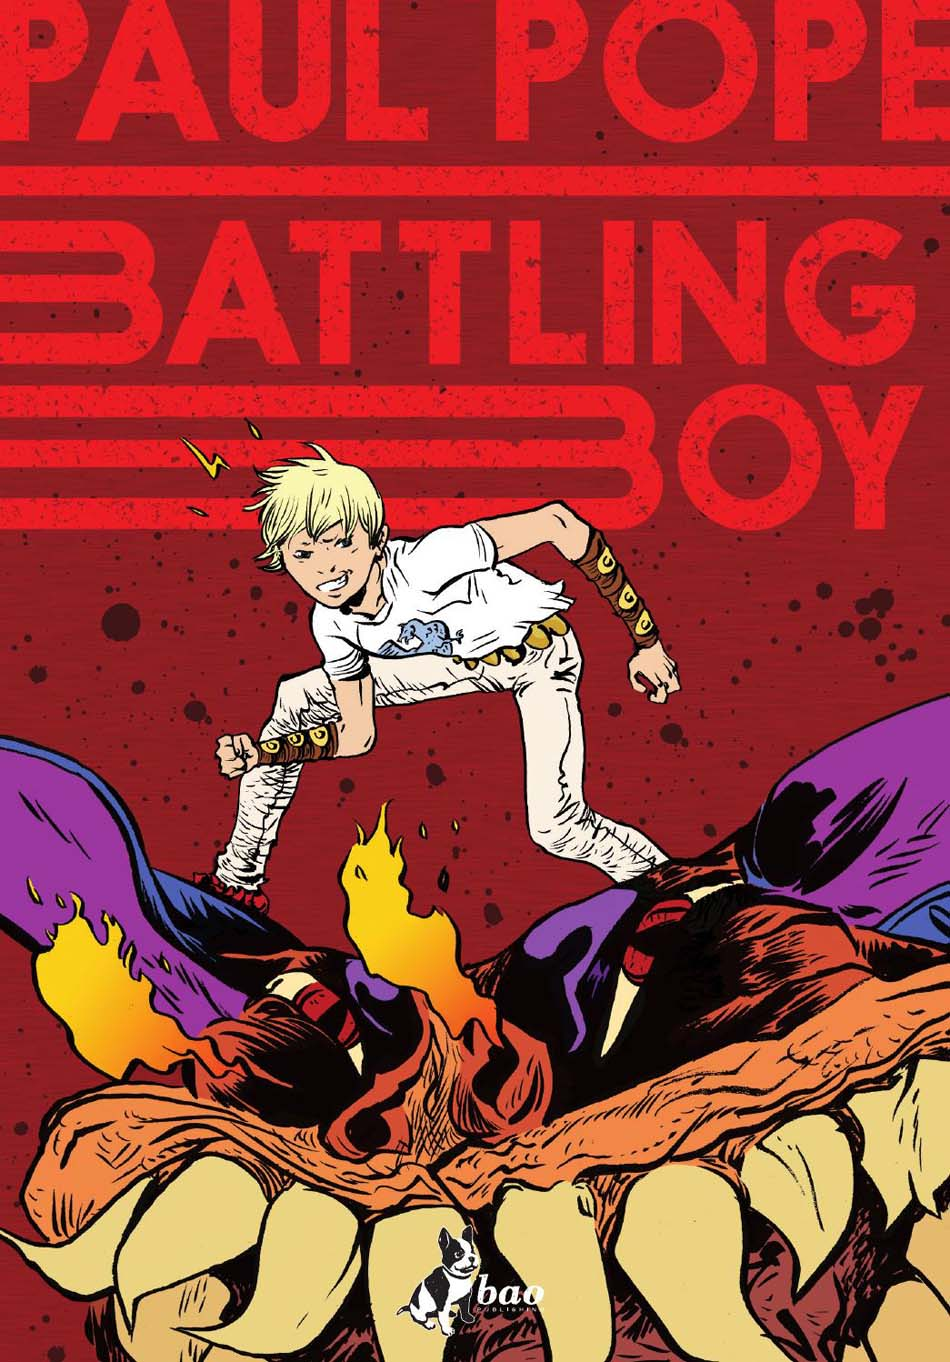 Battling Boy 1 COVER